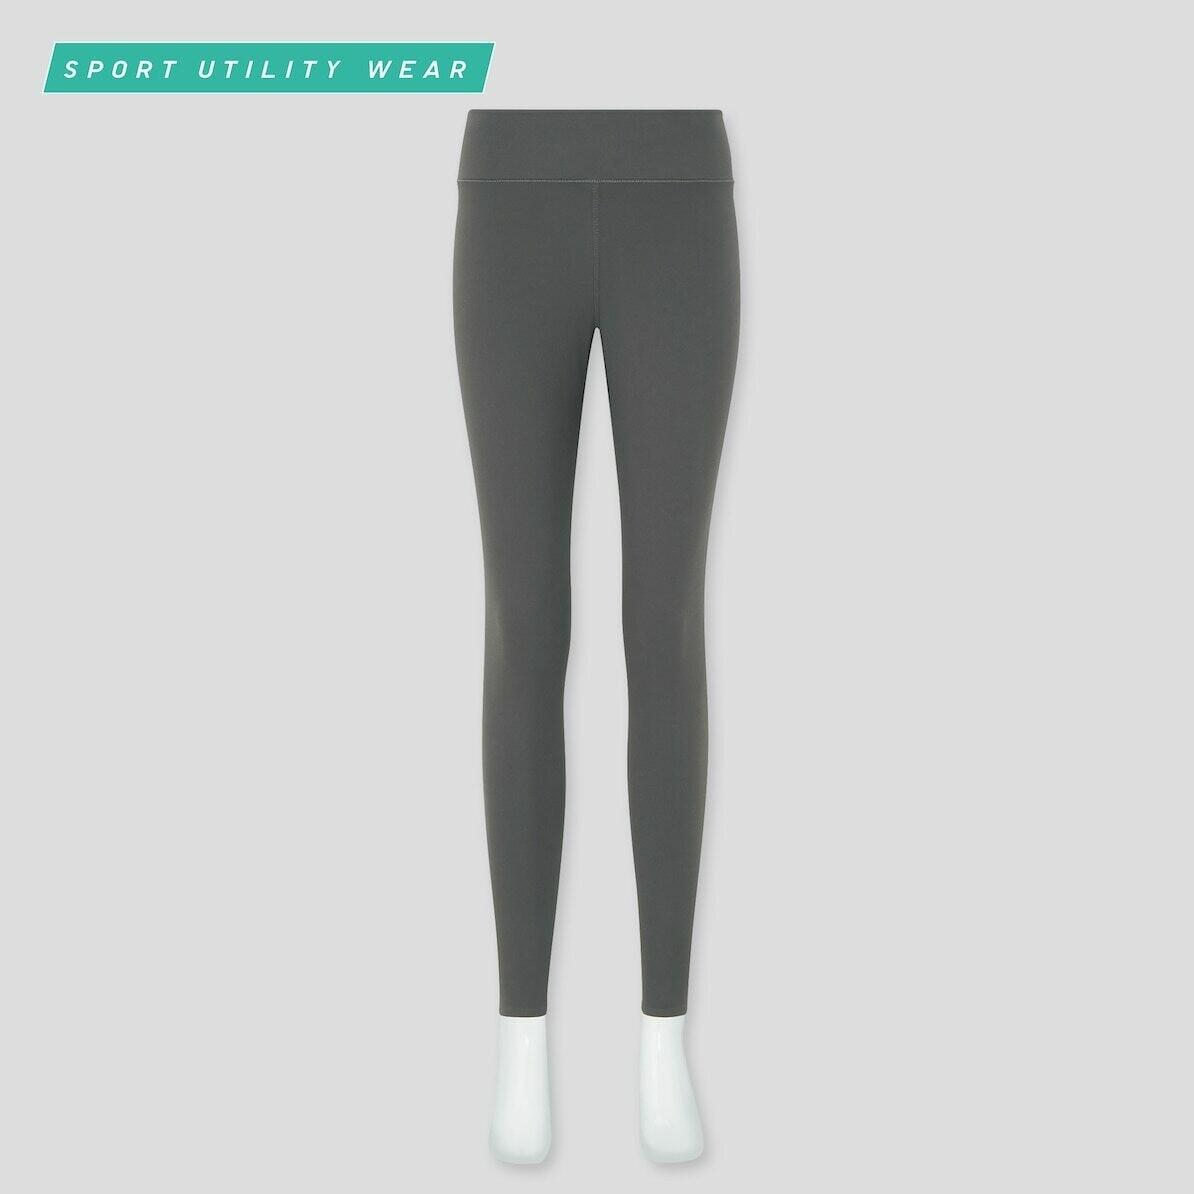 WOMEN AIRISM UV PROTECTION ACTIVE SOFT LEGGINGS (comprimento mais longo 63,5-65,5 cm) - 07 GRAY